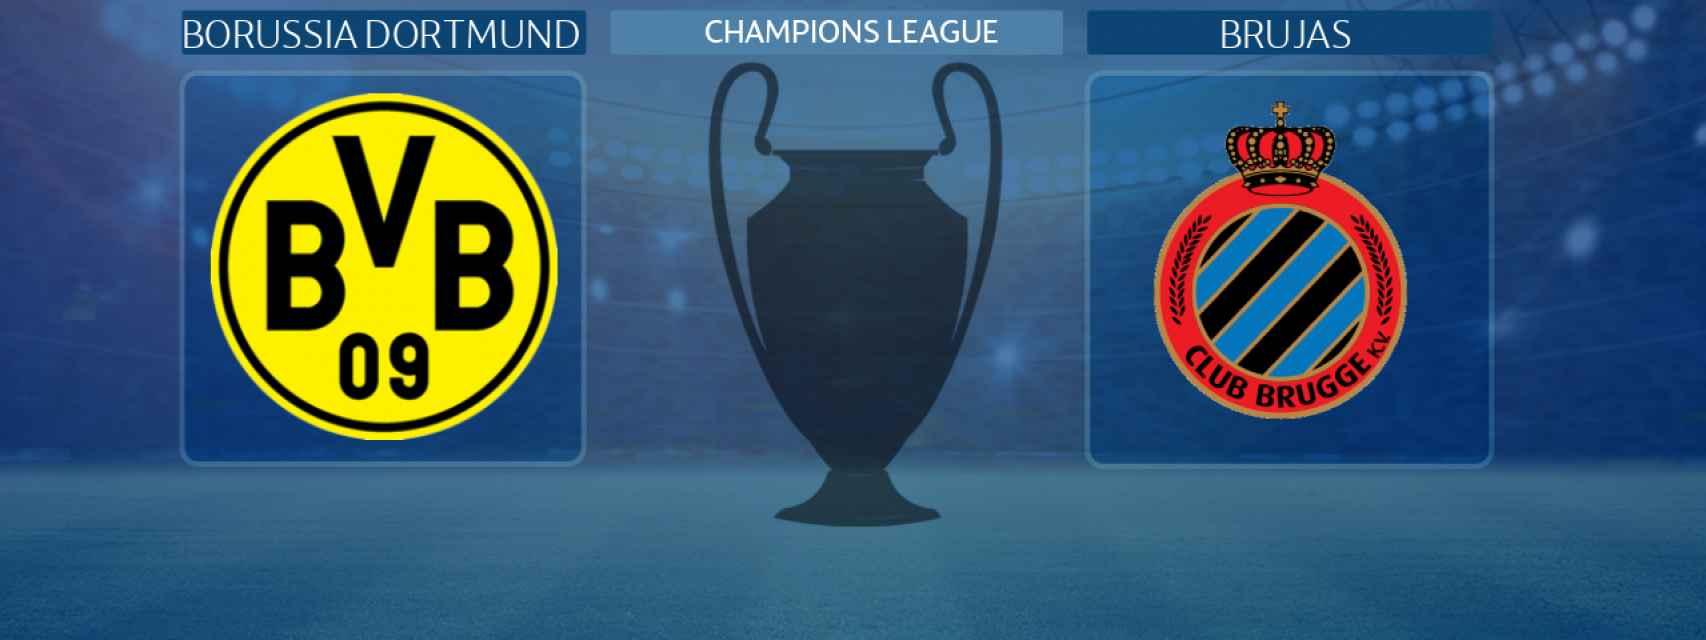 Borussia Dortmund - Brujas, partido de la Champions League